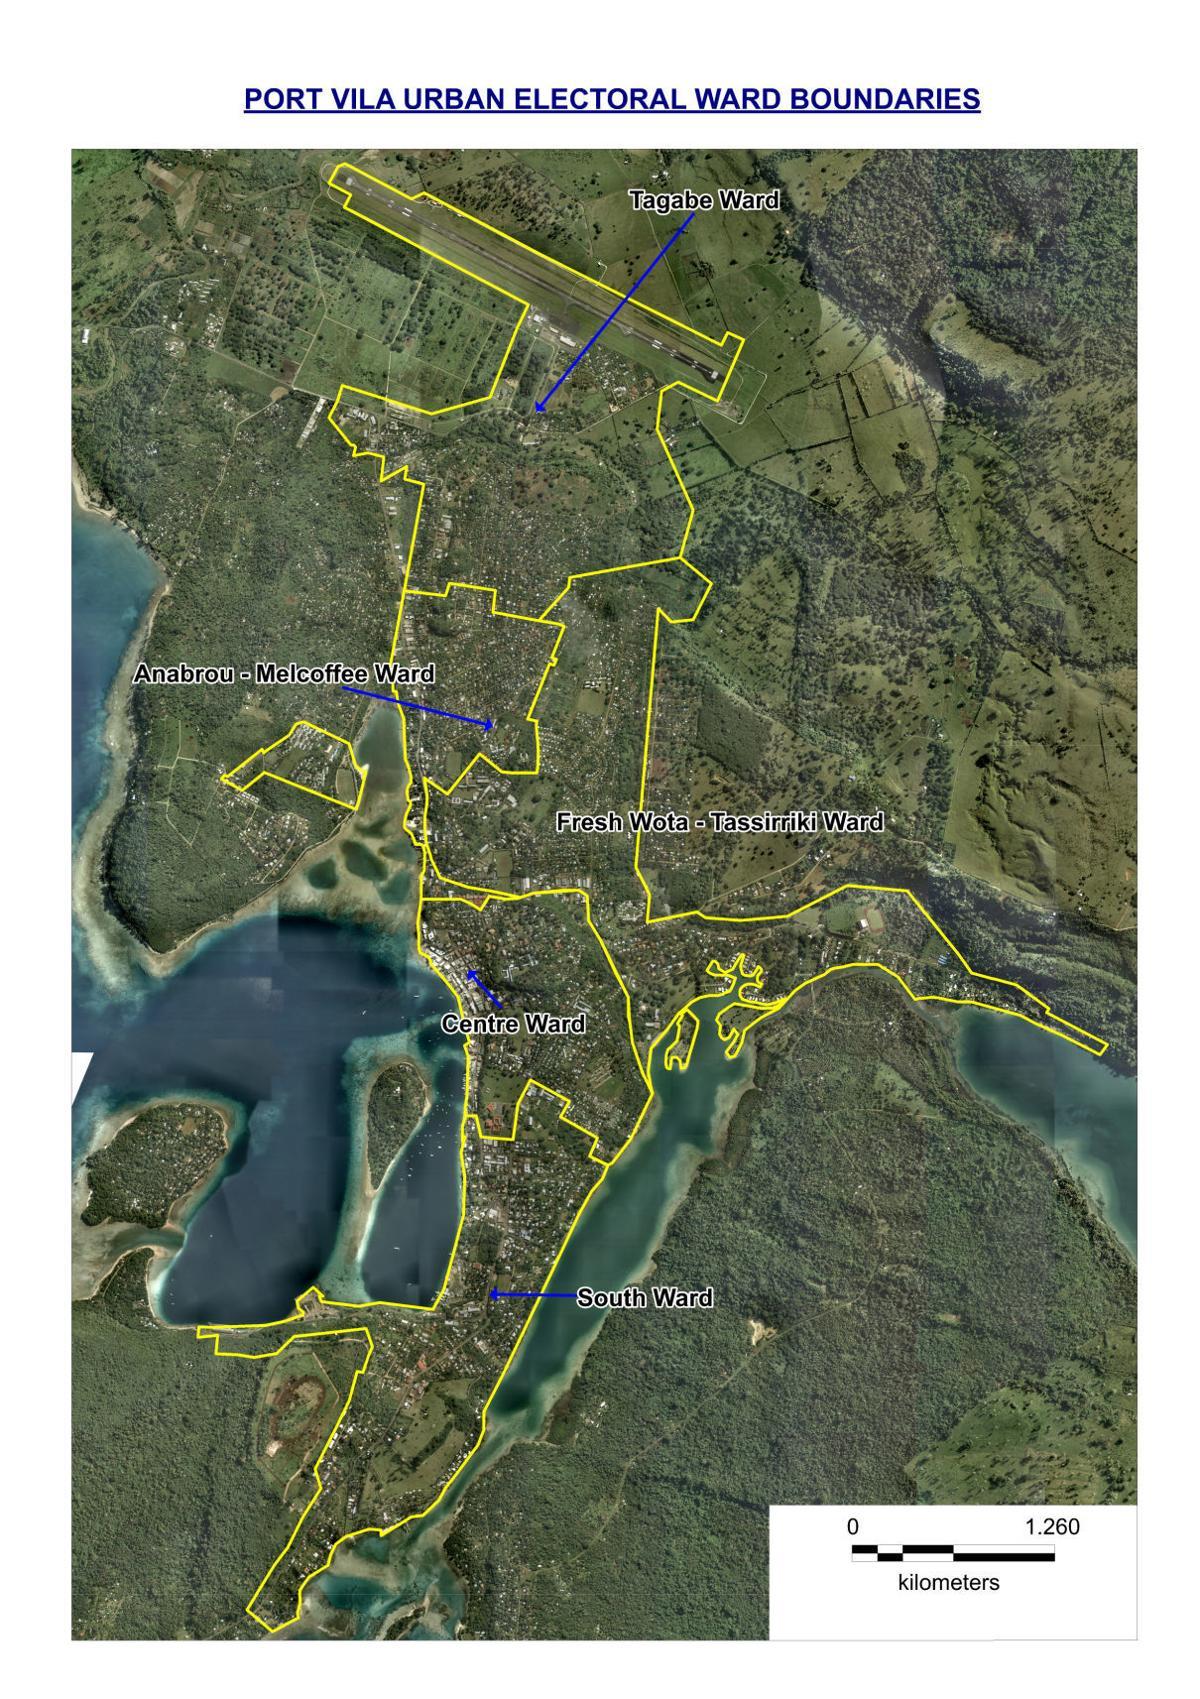 Port Vila Urban Electoral Ward Boundaries, Respect them: Tete